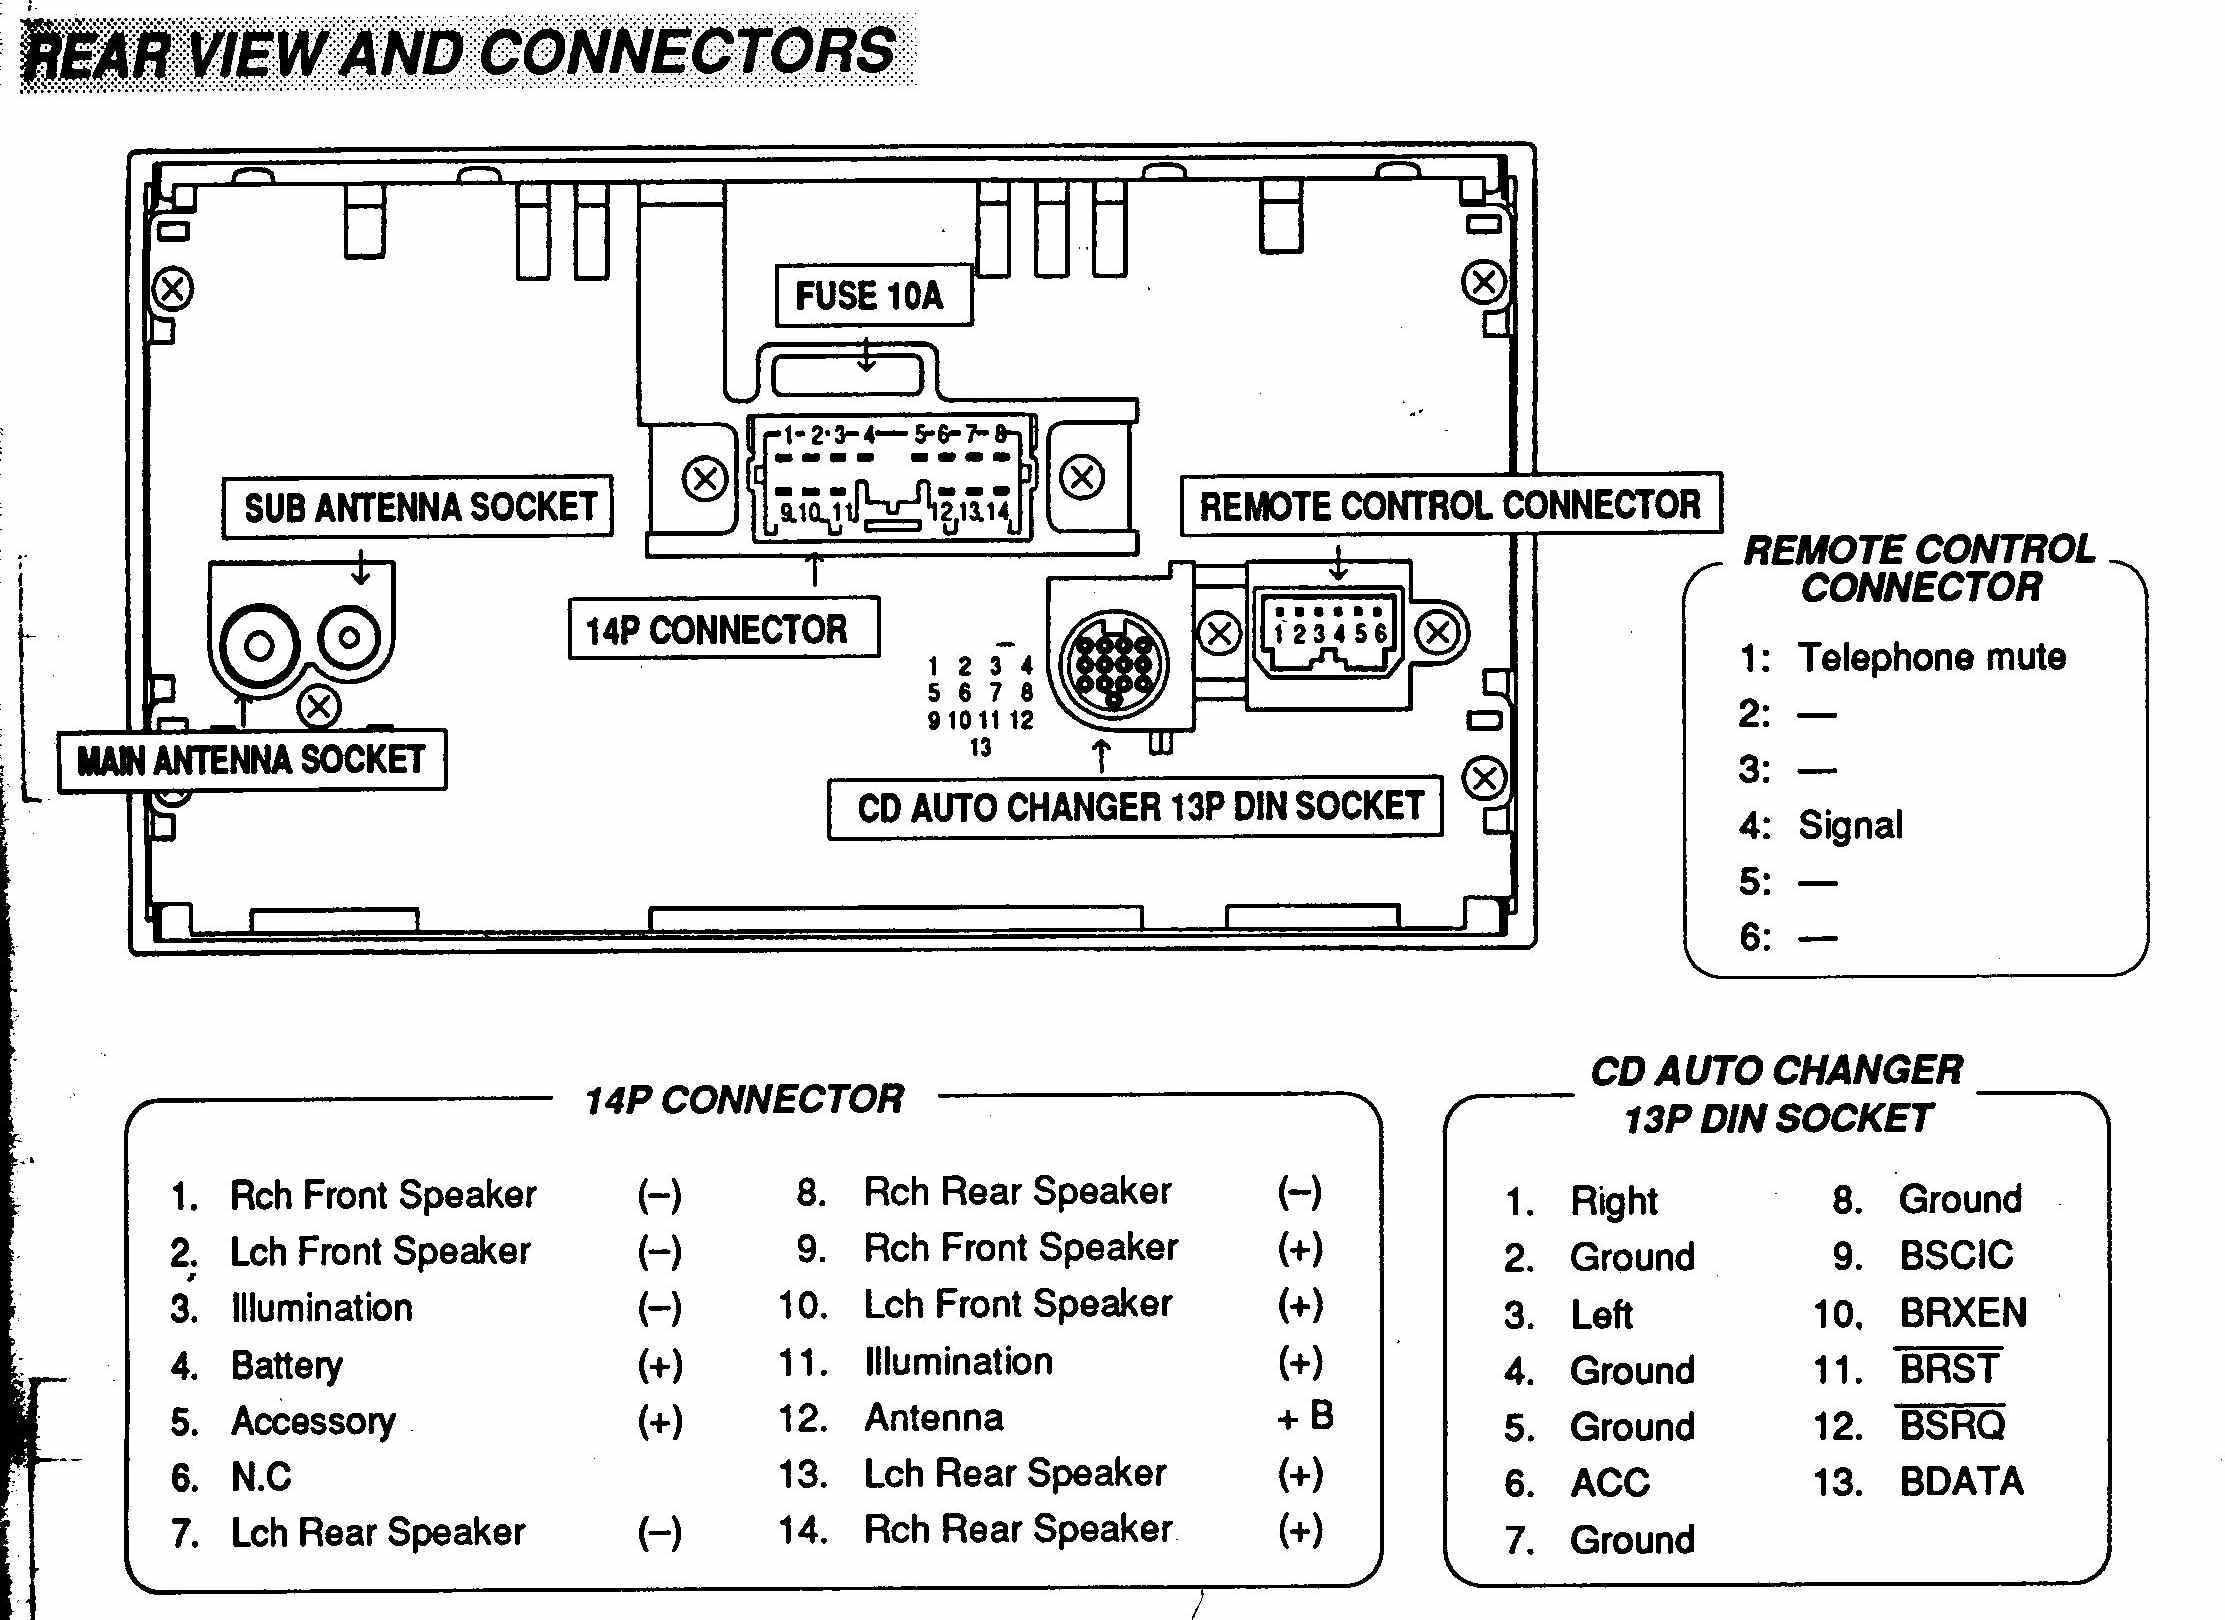 2000 Vw Jetta Stereo Wiring Diagram Wiring Diagram Moreover 2001 Mitsubishi Eclipse Radio Wiring Diagram Of 2000 Vw Jetta Stereo Wiring Diagram 2000 Vw Jetta Vr6 Fuse Box Diagram Radio Wiring Tdi Location